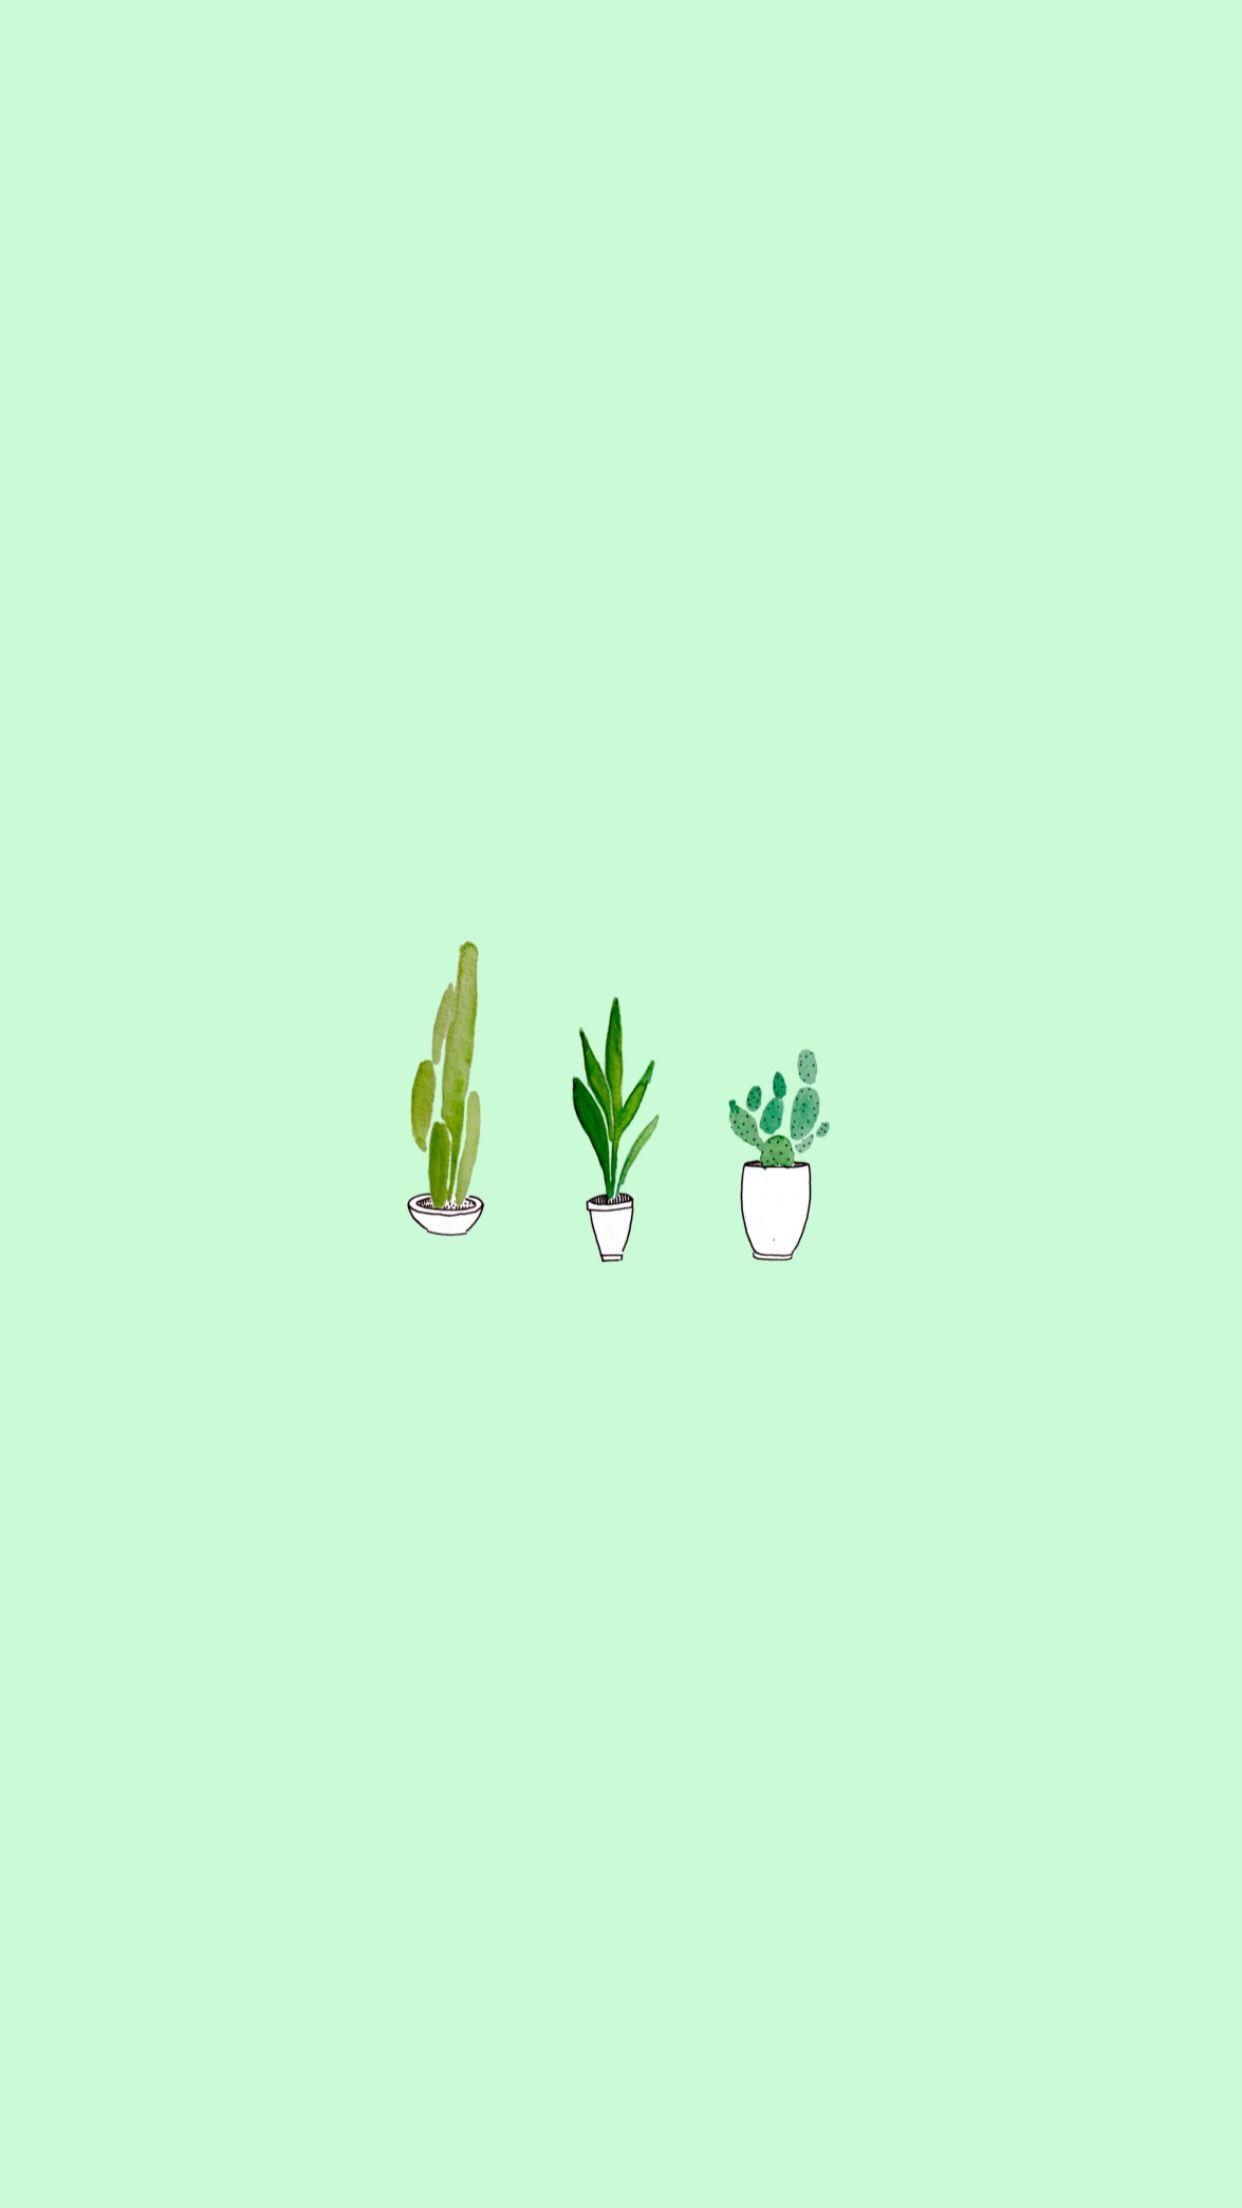 Light Green Aesthetic : light, green, aesthetic, Green, Aesthetic, Wallpapers, Wallpaper